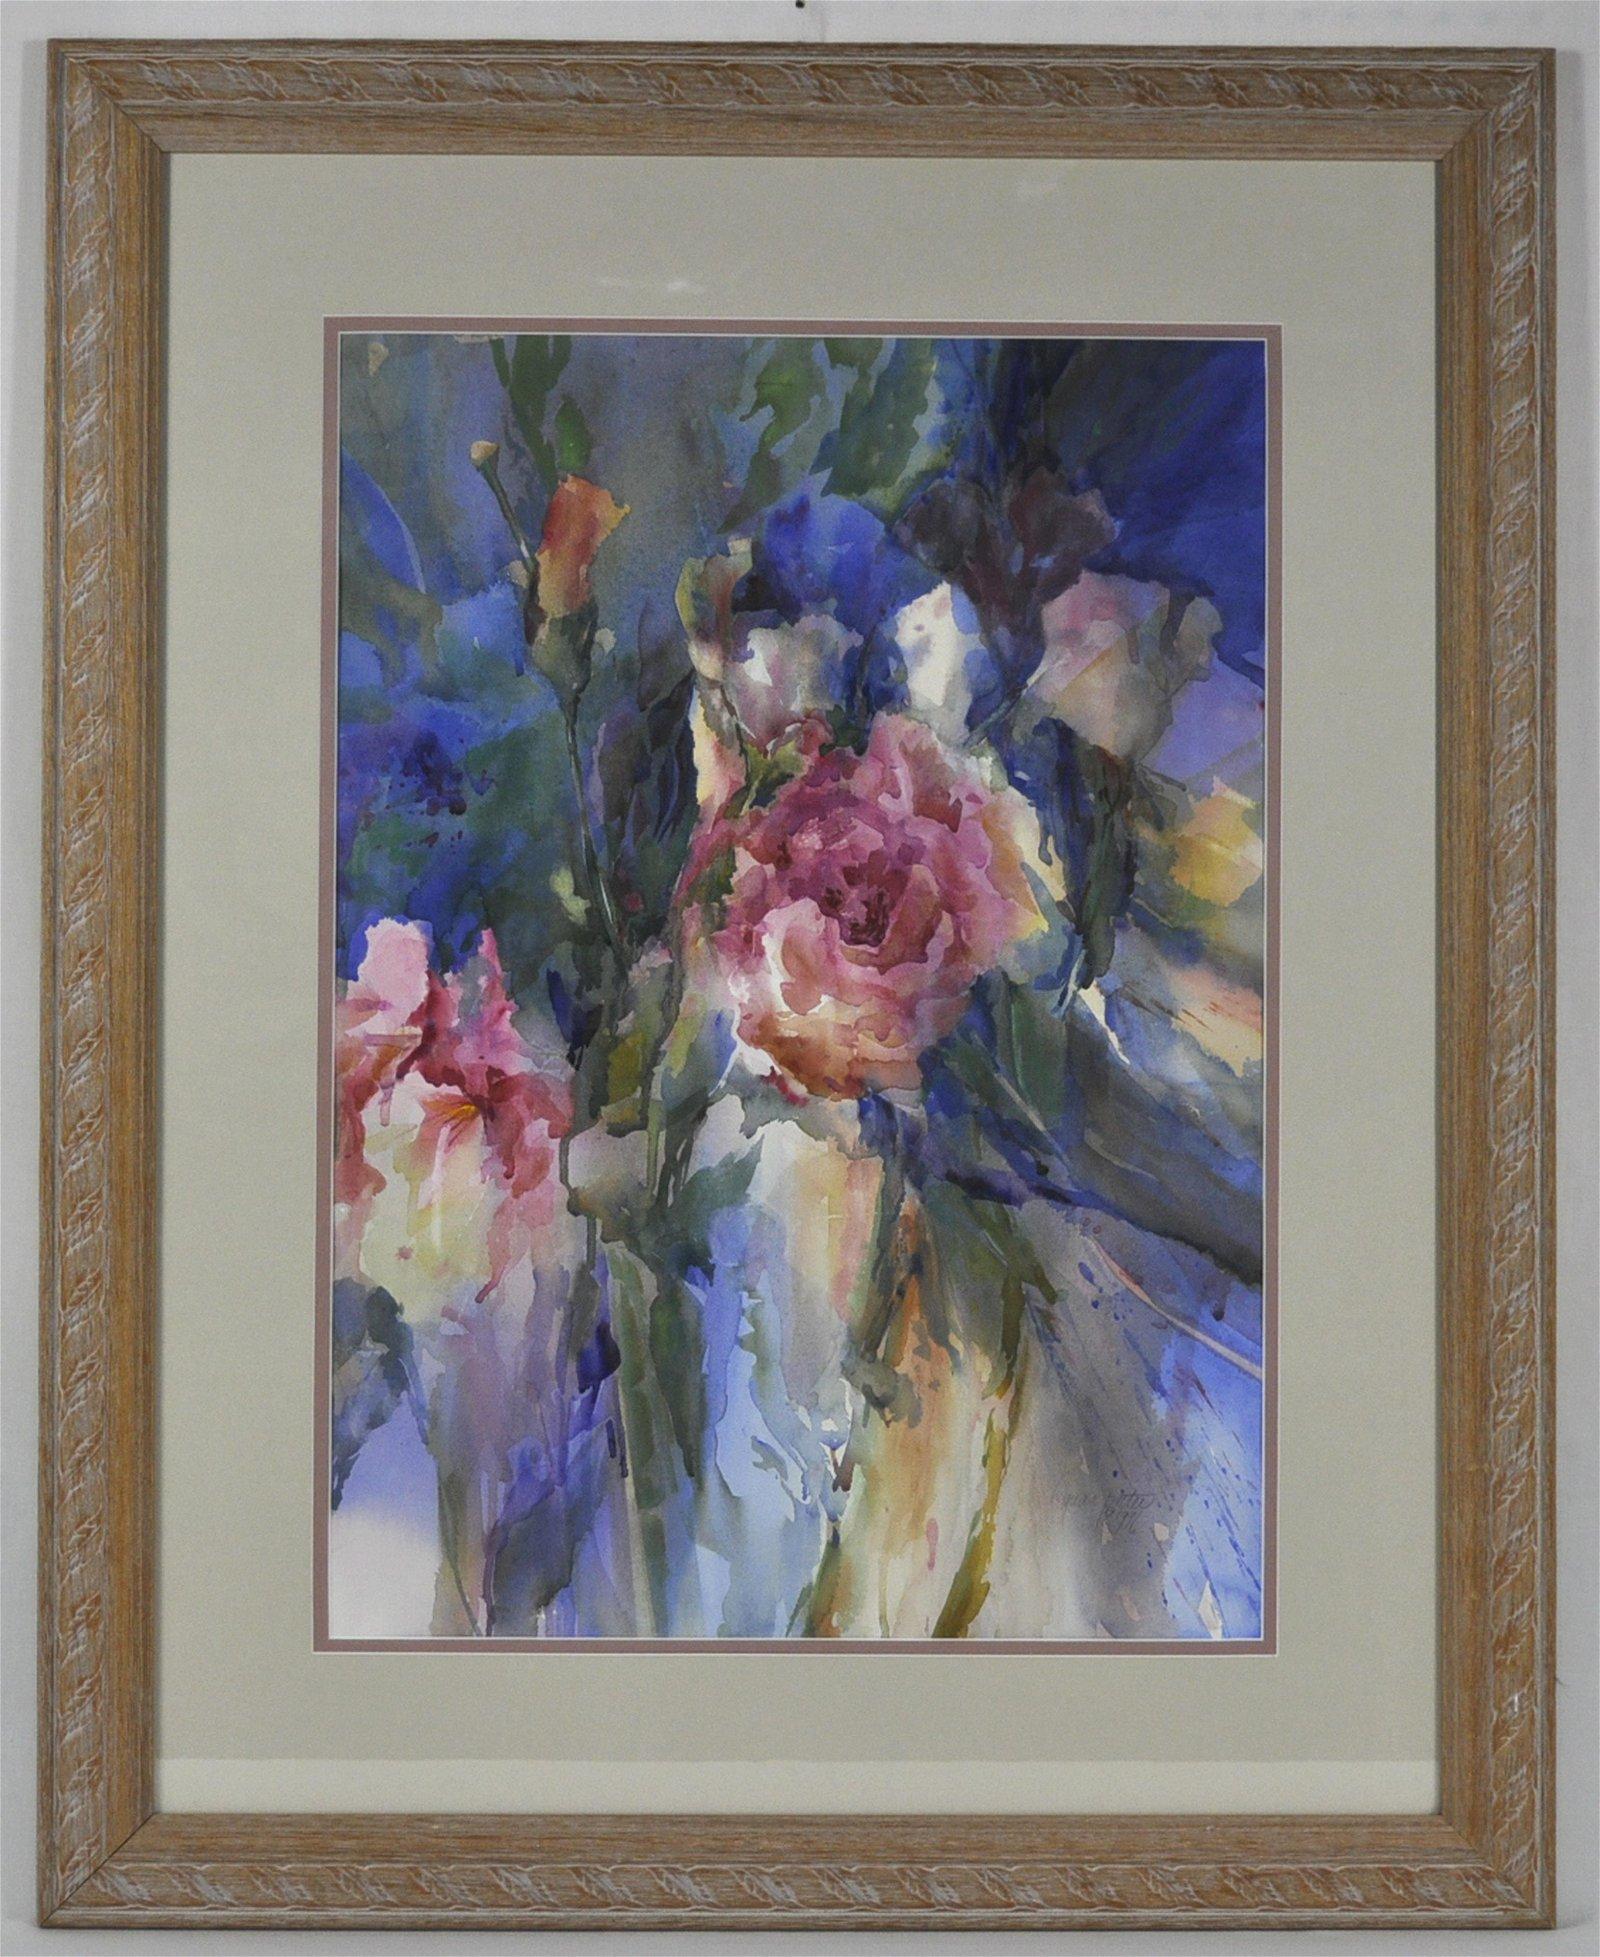 Lynda Potter Watercolor Of A Garden In Bloom